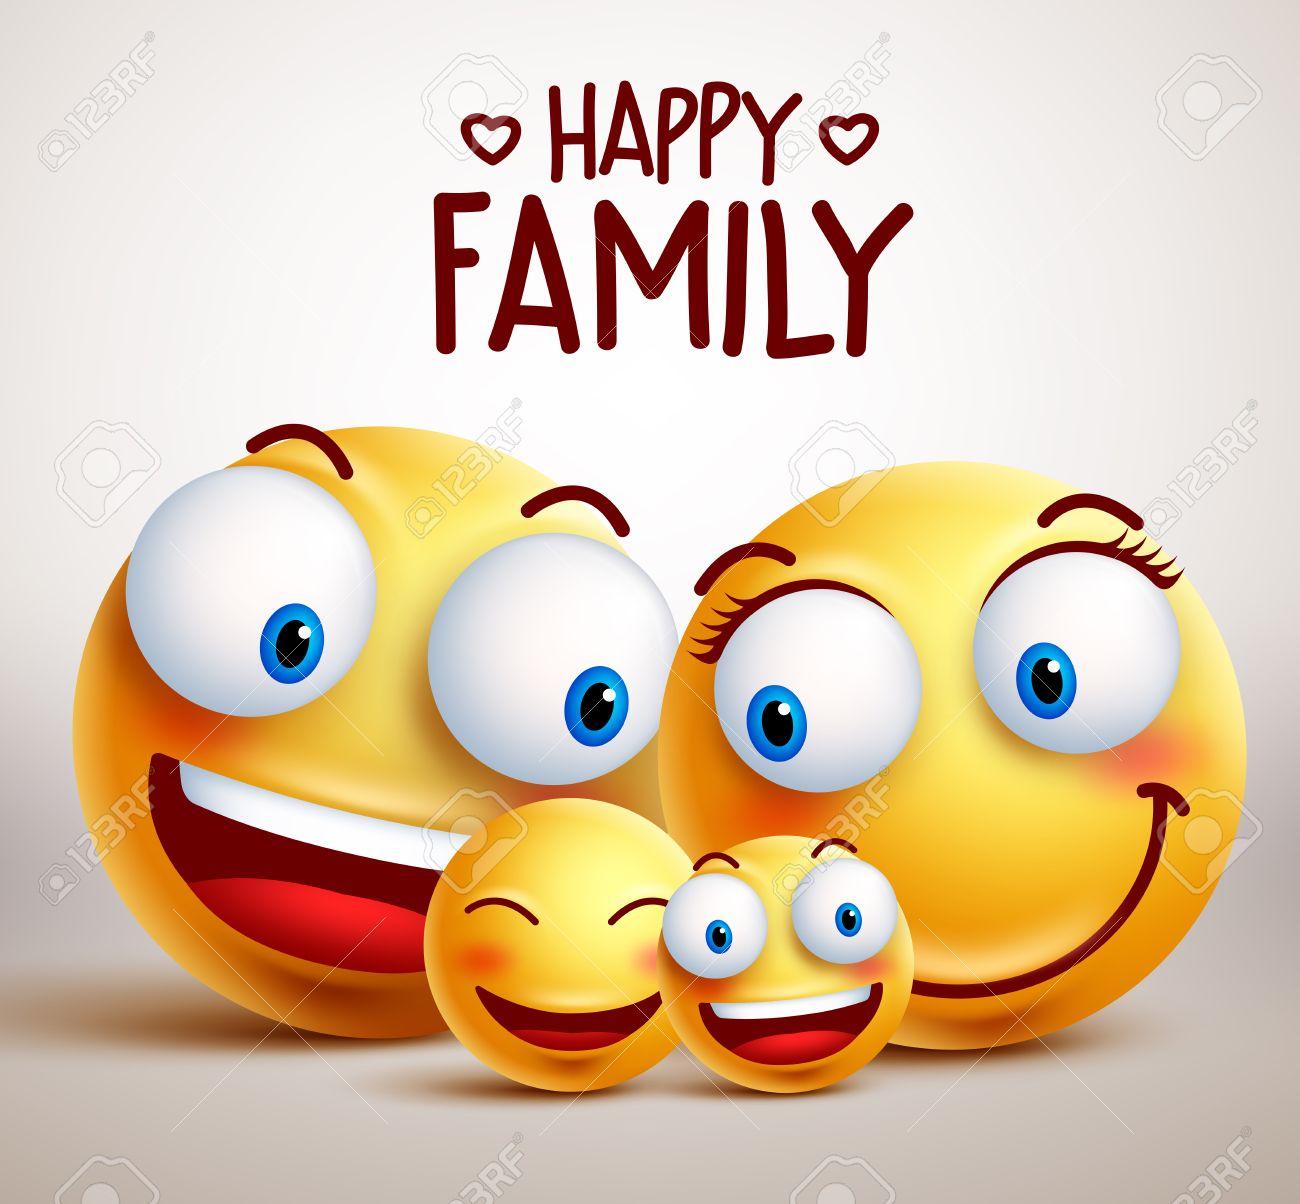 happy family smiley face